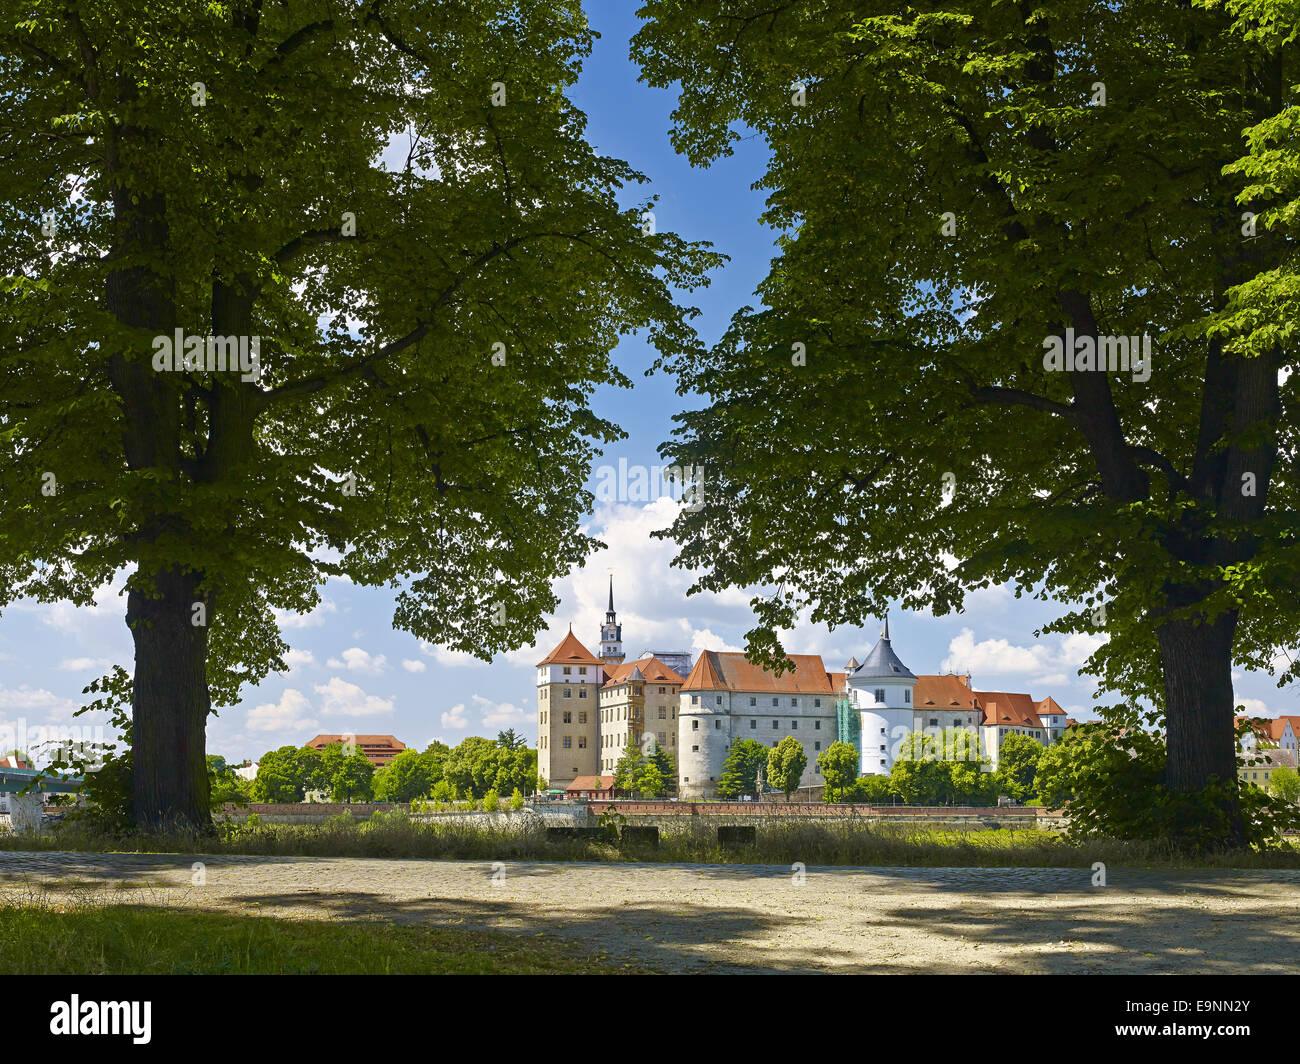 Castle Hartenfels, Torgau, Germany Stock Photo